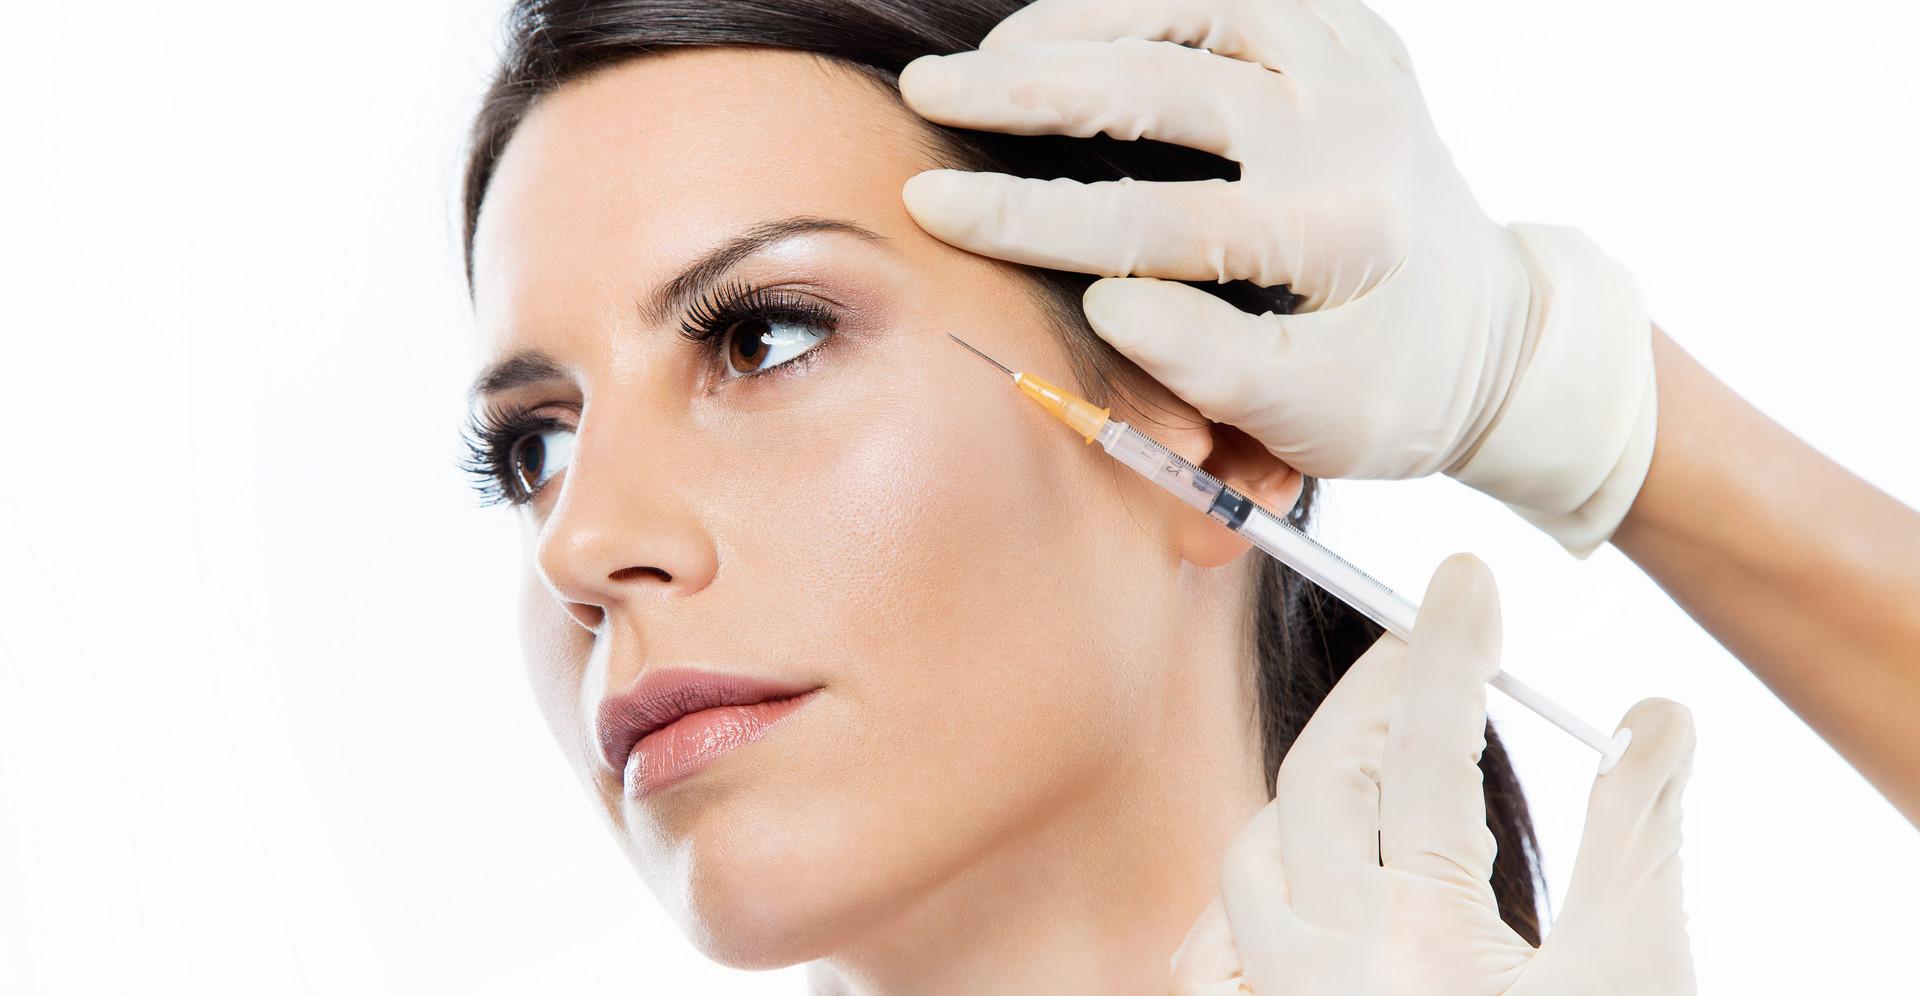 Nonsurgical Aesthetic Procedures